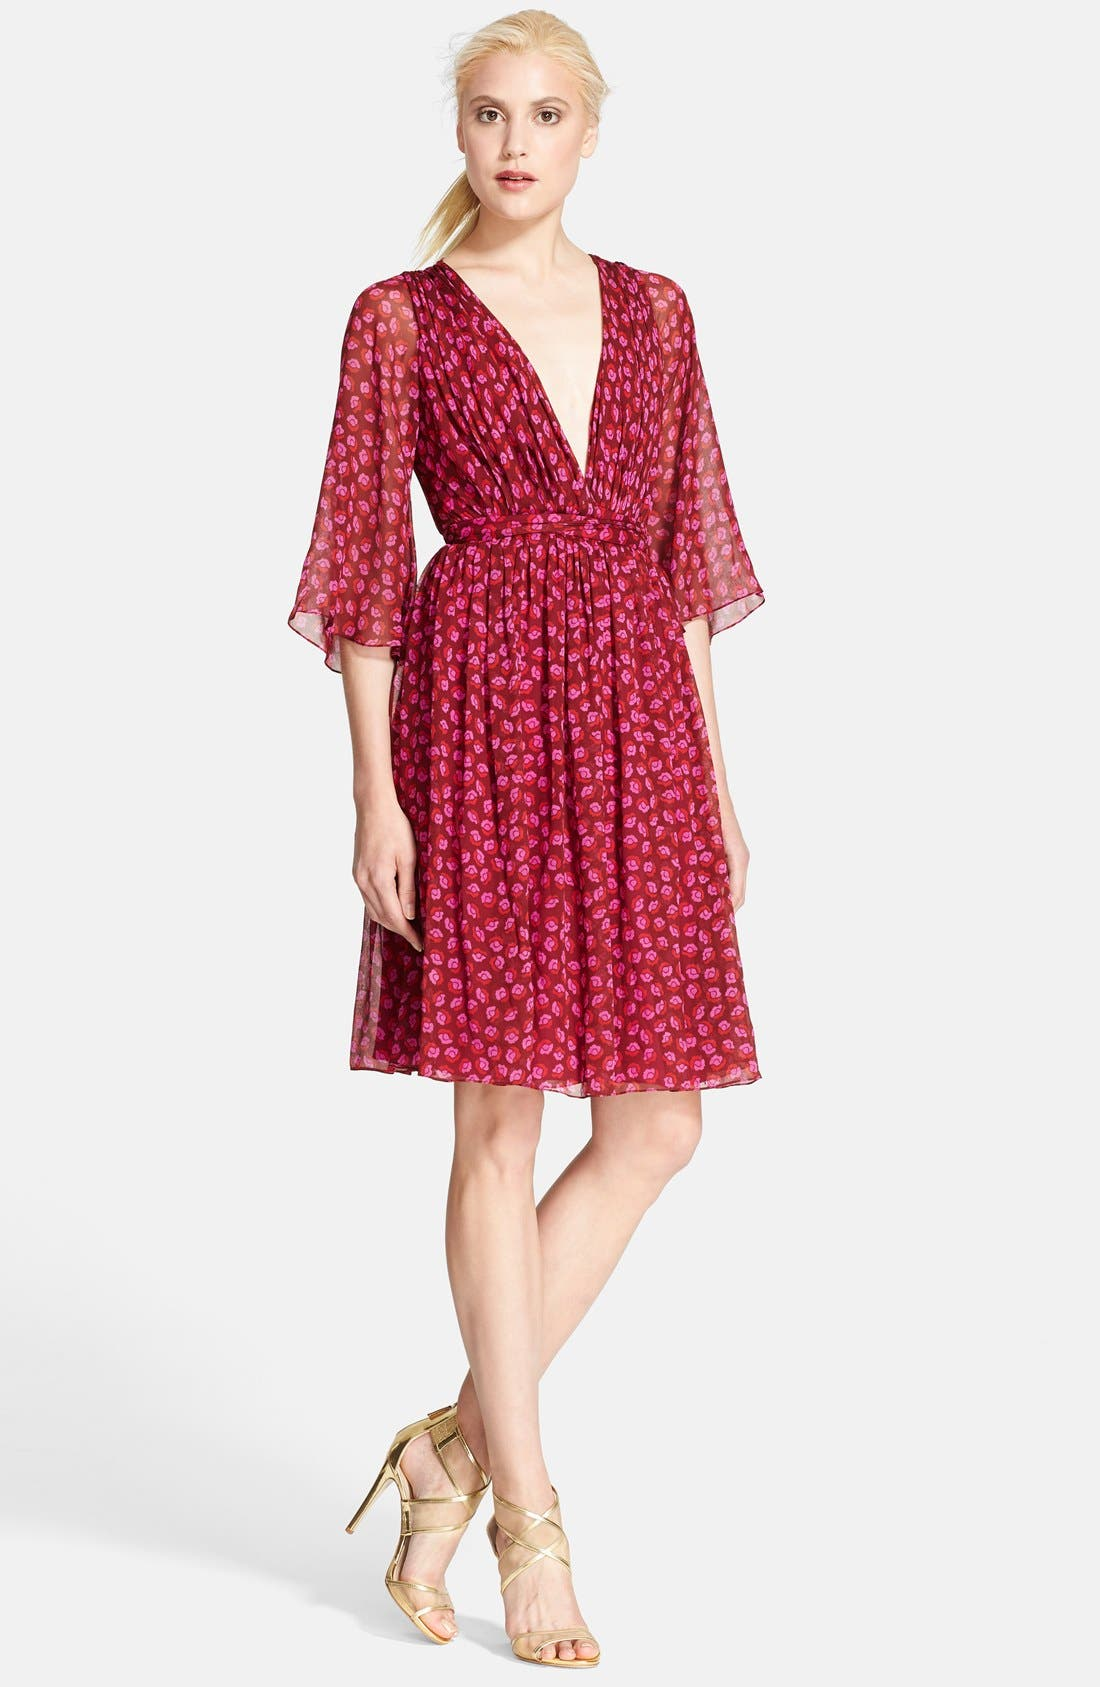 Alternate Image 1 Selected - Diane von Furstenberg 'Alicia' Dress